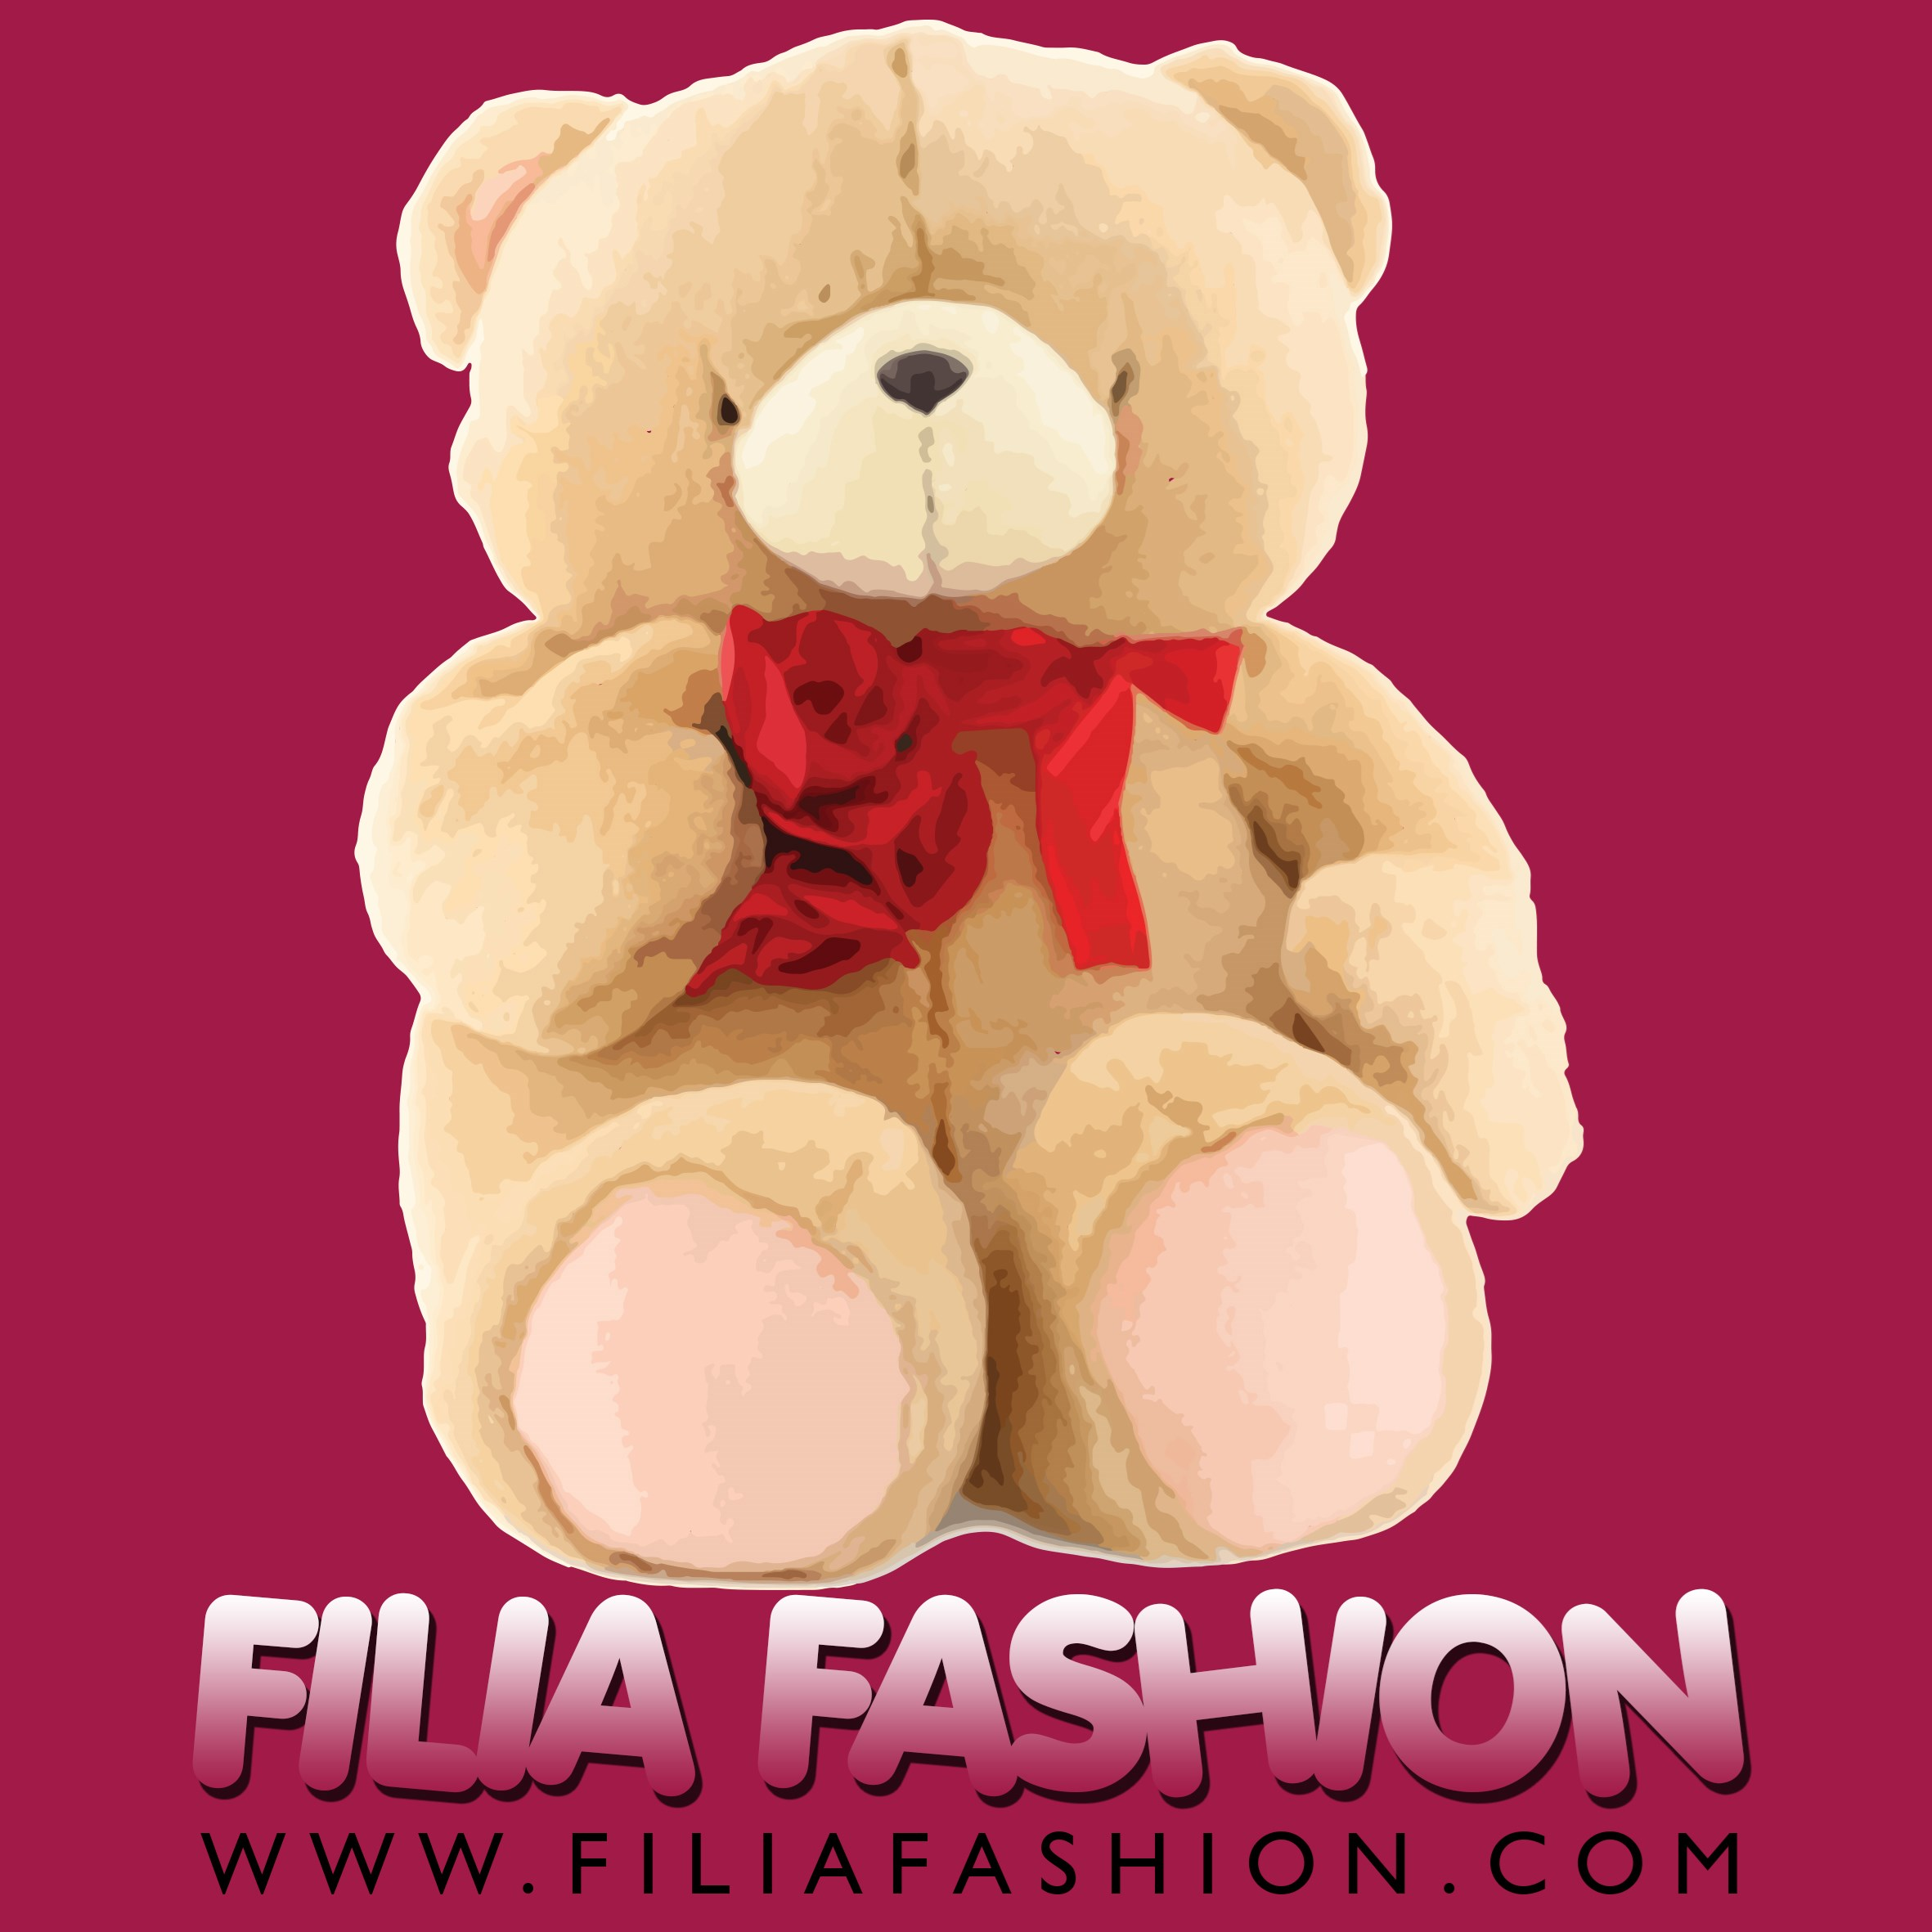 Filia Fashion